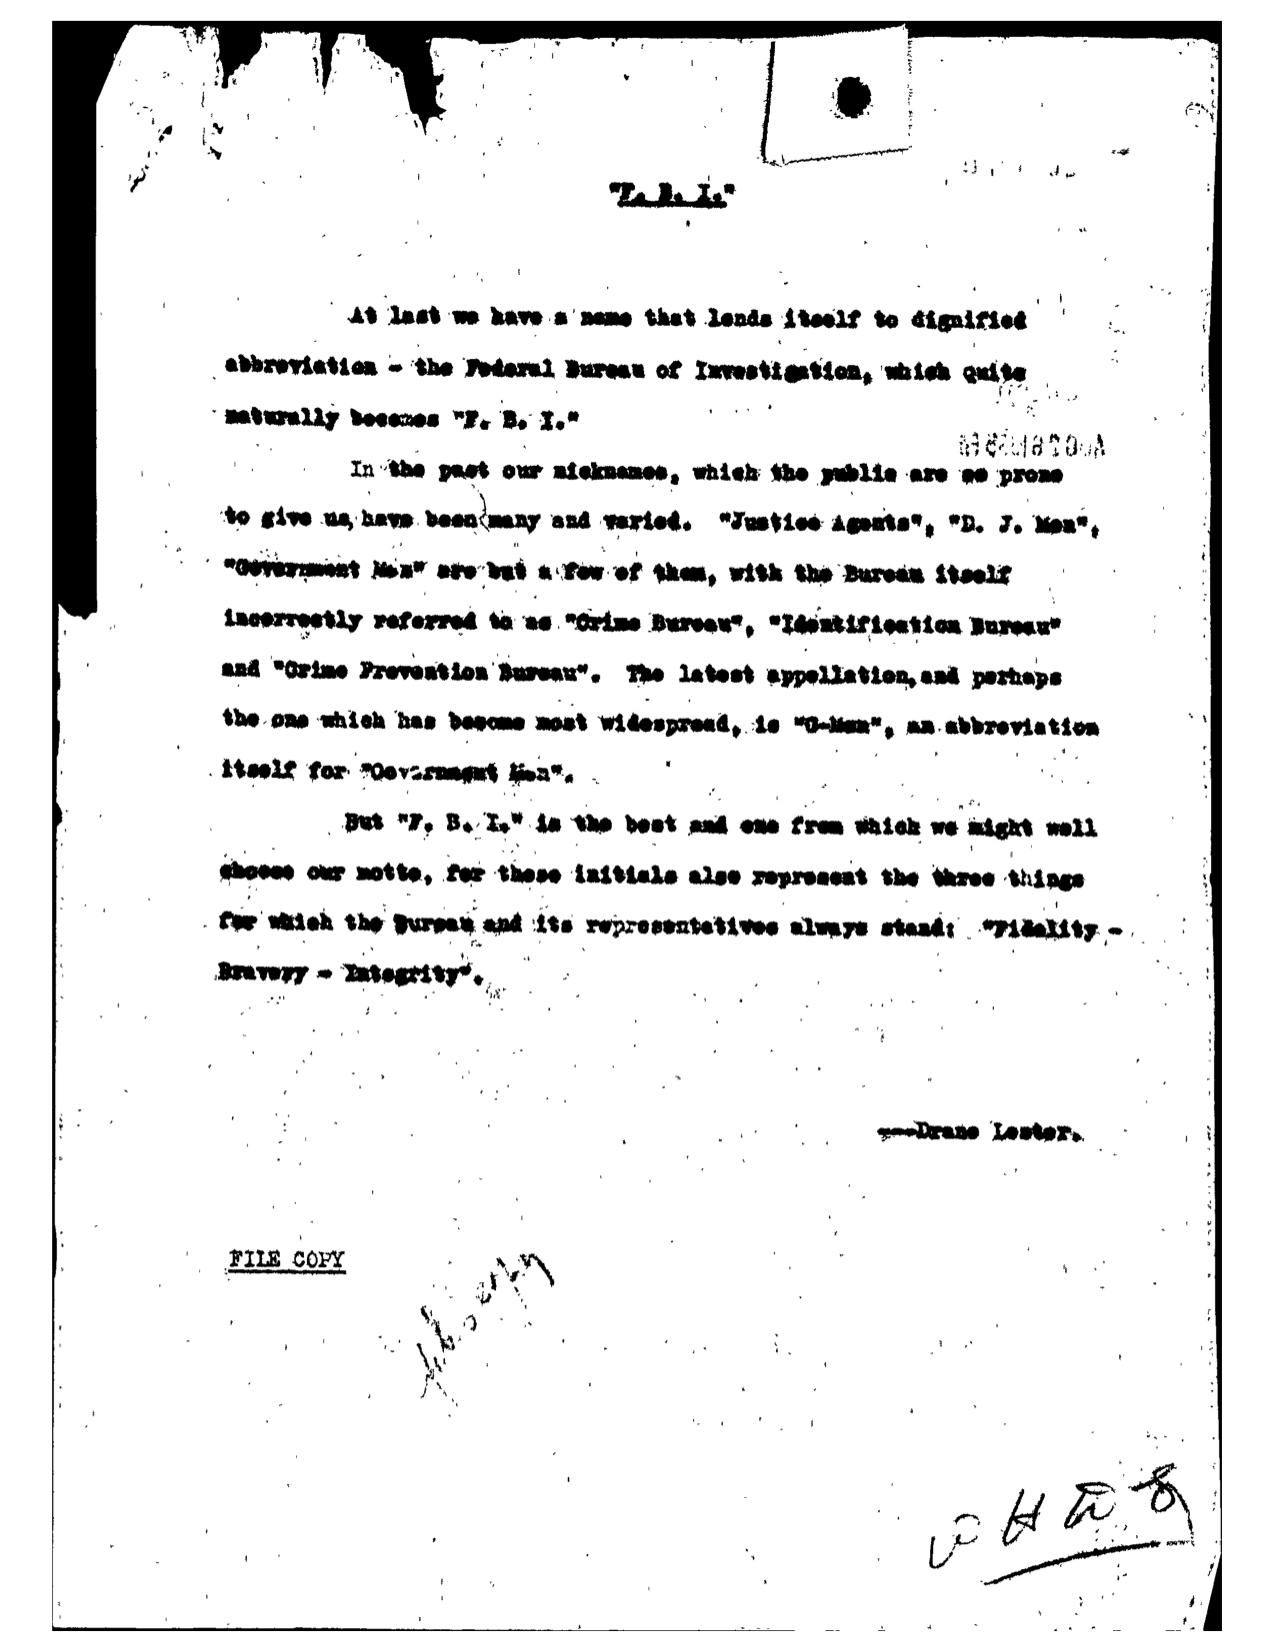 Lester's original document (copy) from FBI files.